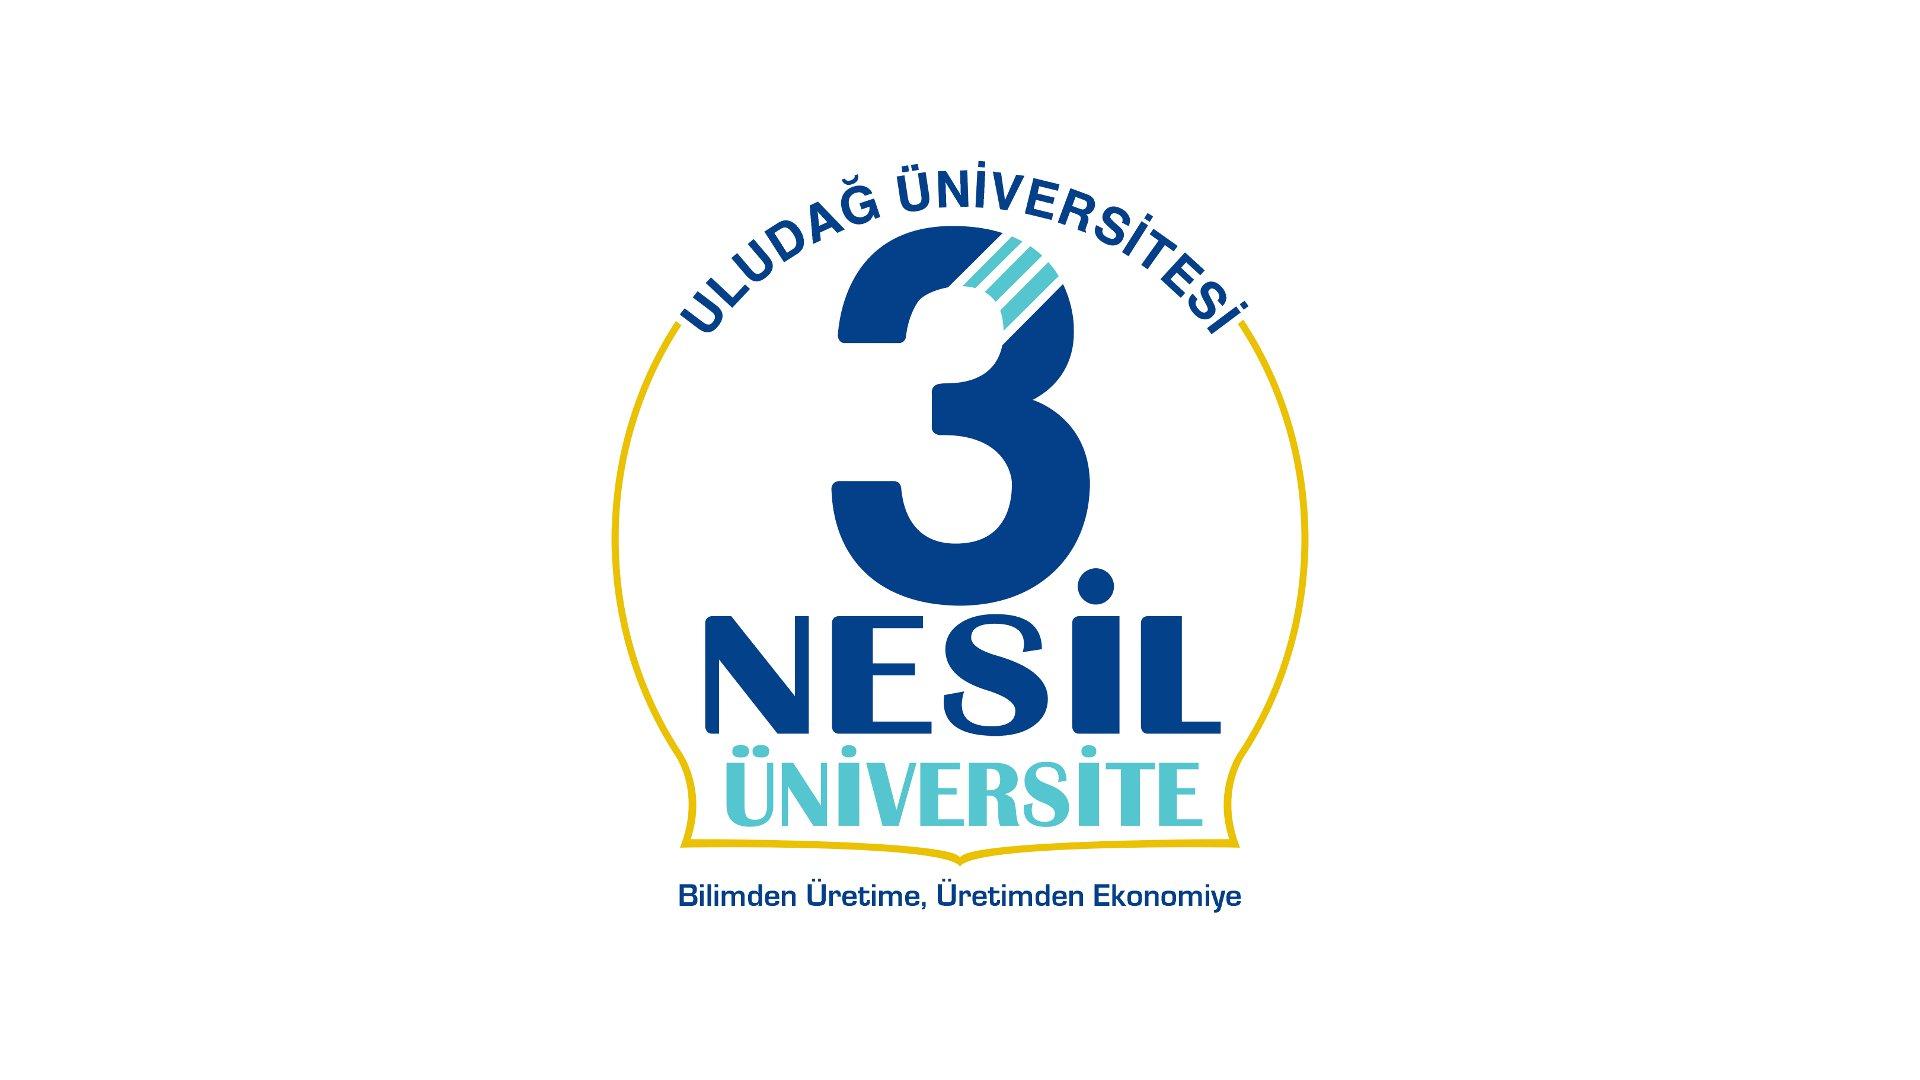 3. Nesil Üniversite